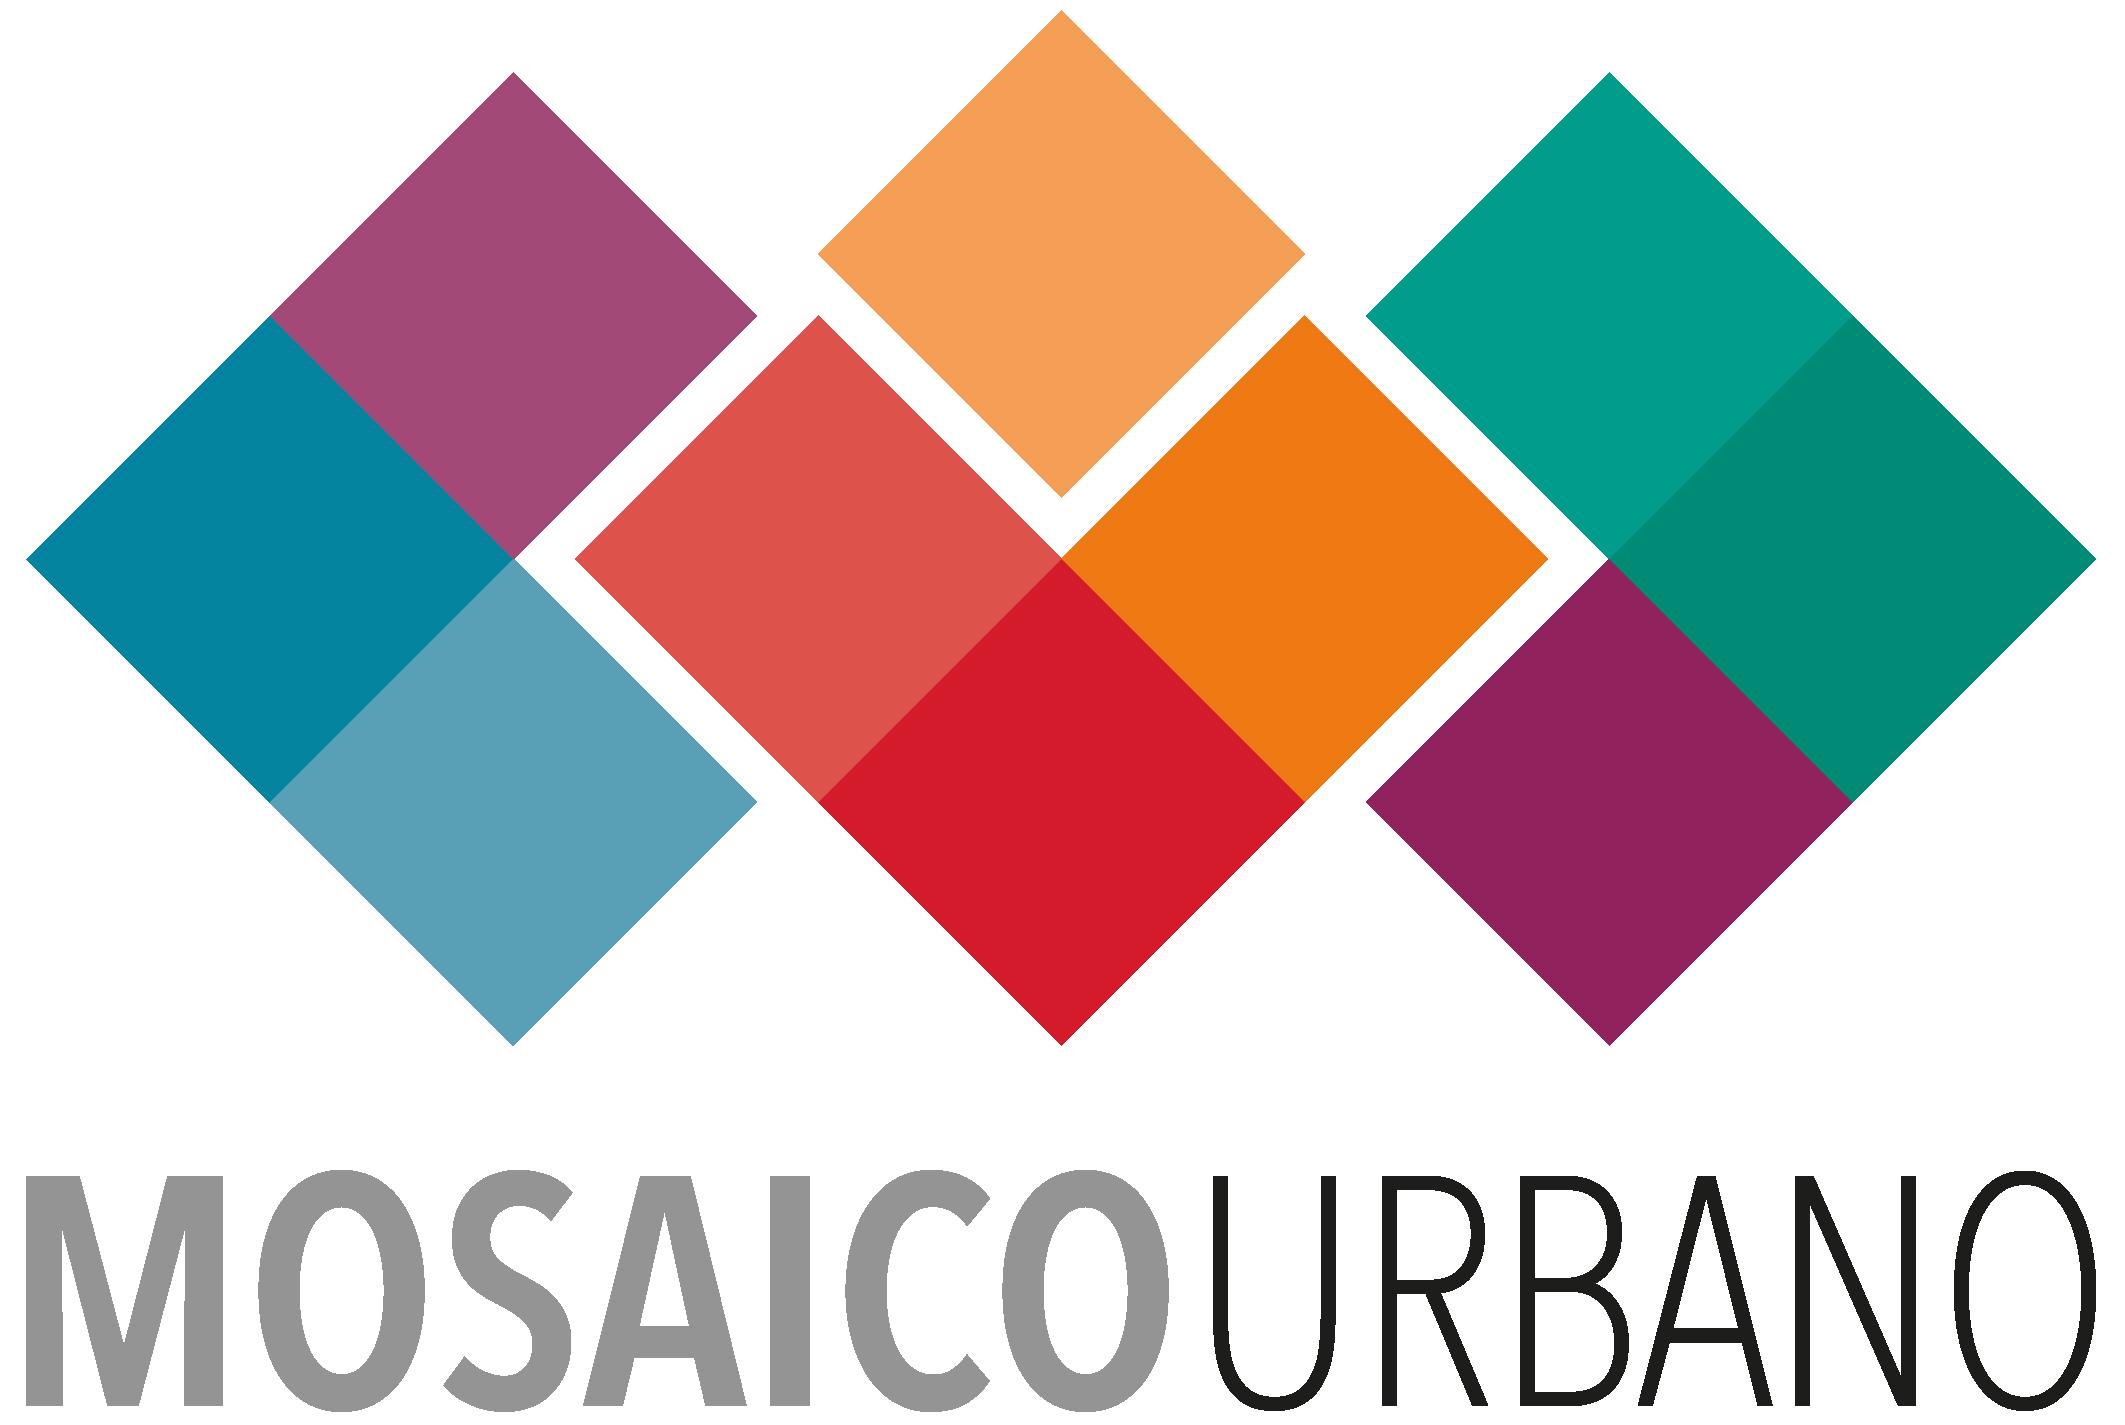 Mosaico Urbano